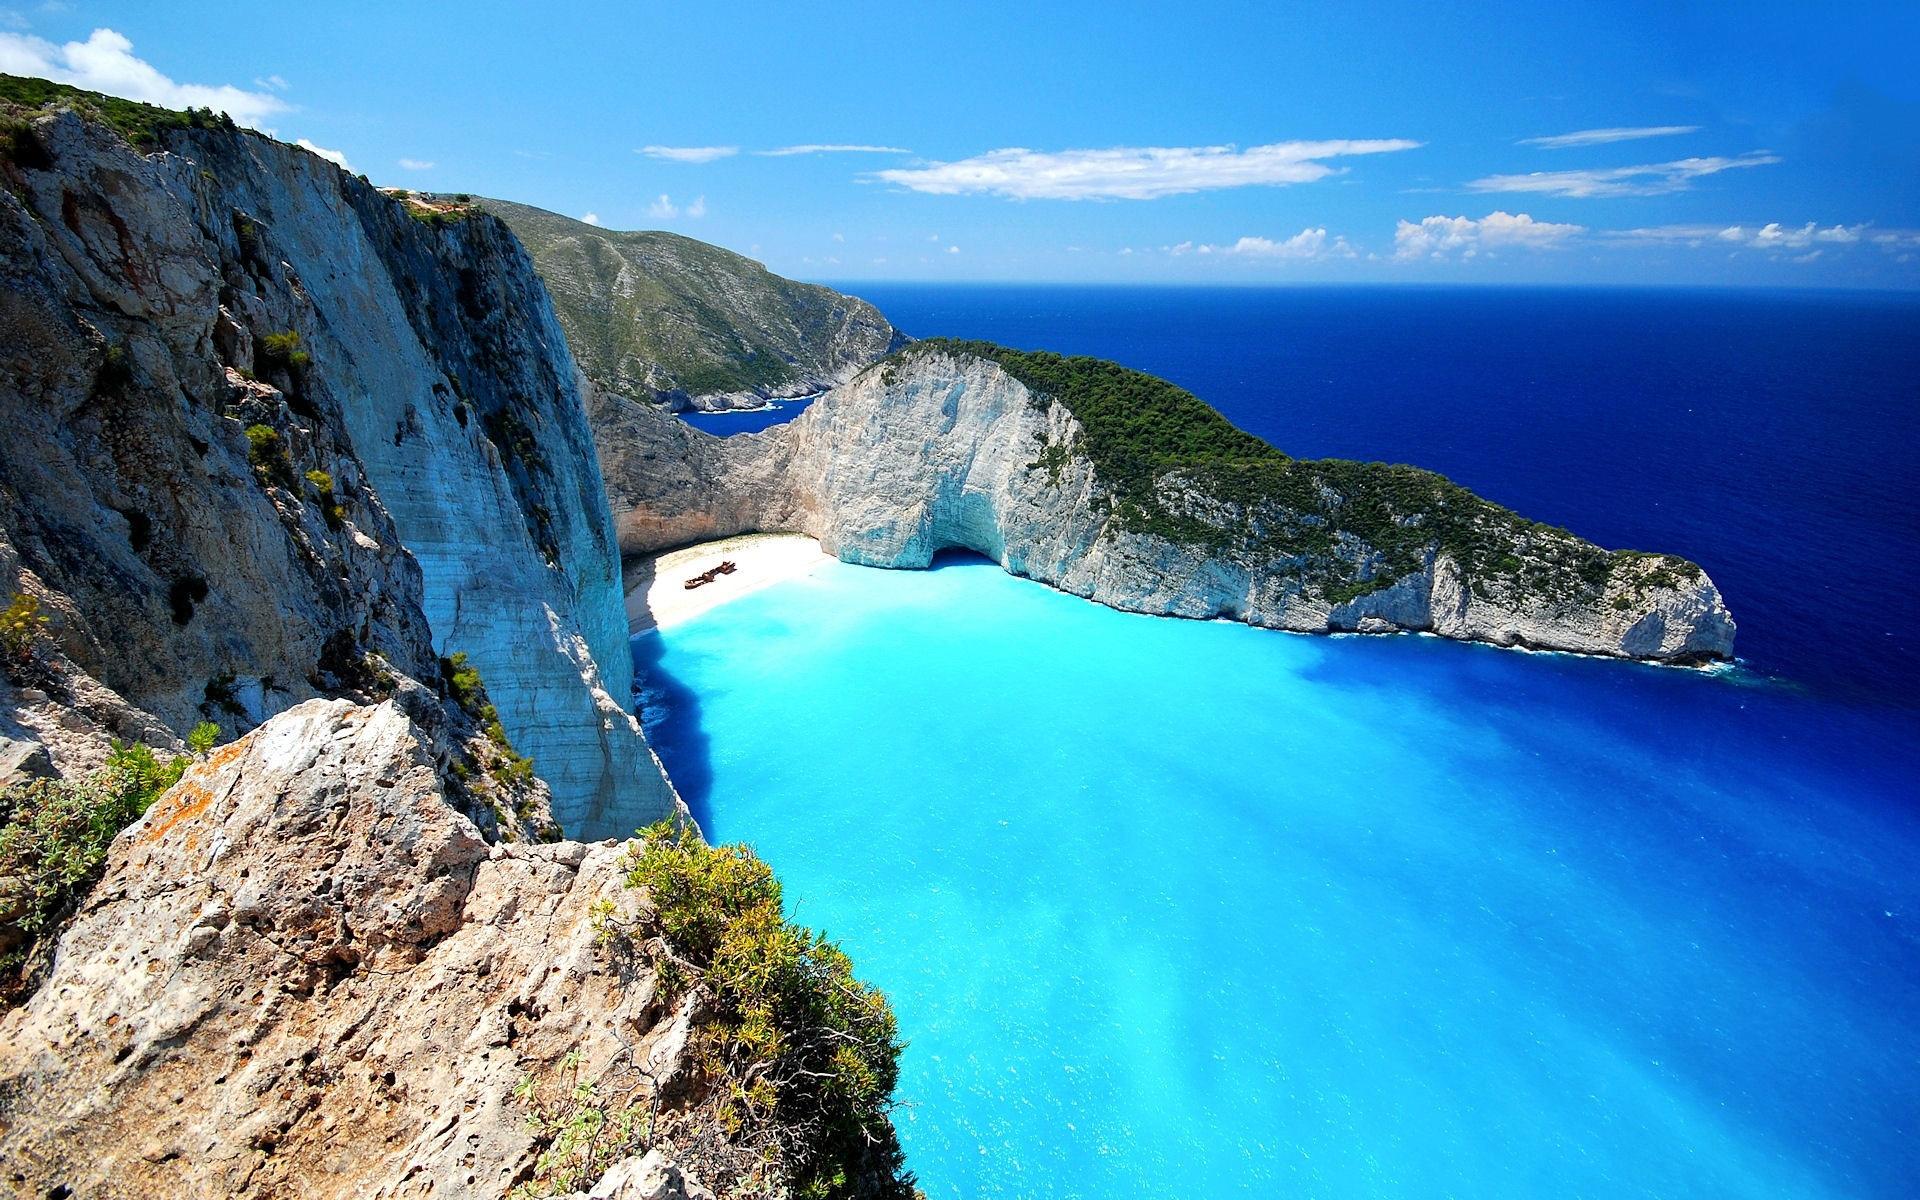 navagio_shipwreck_bay_zakynthos_island-wide